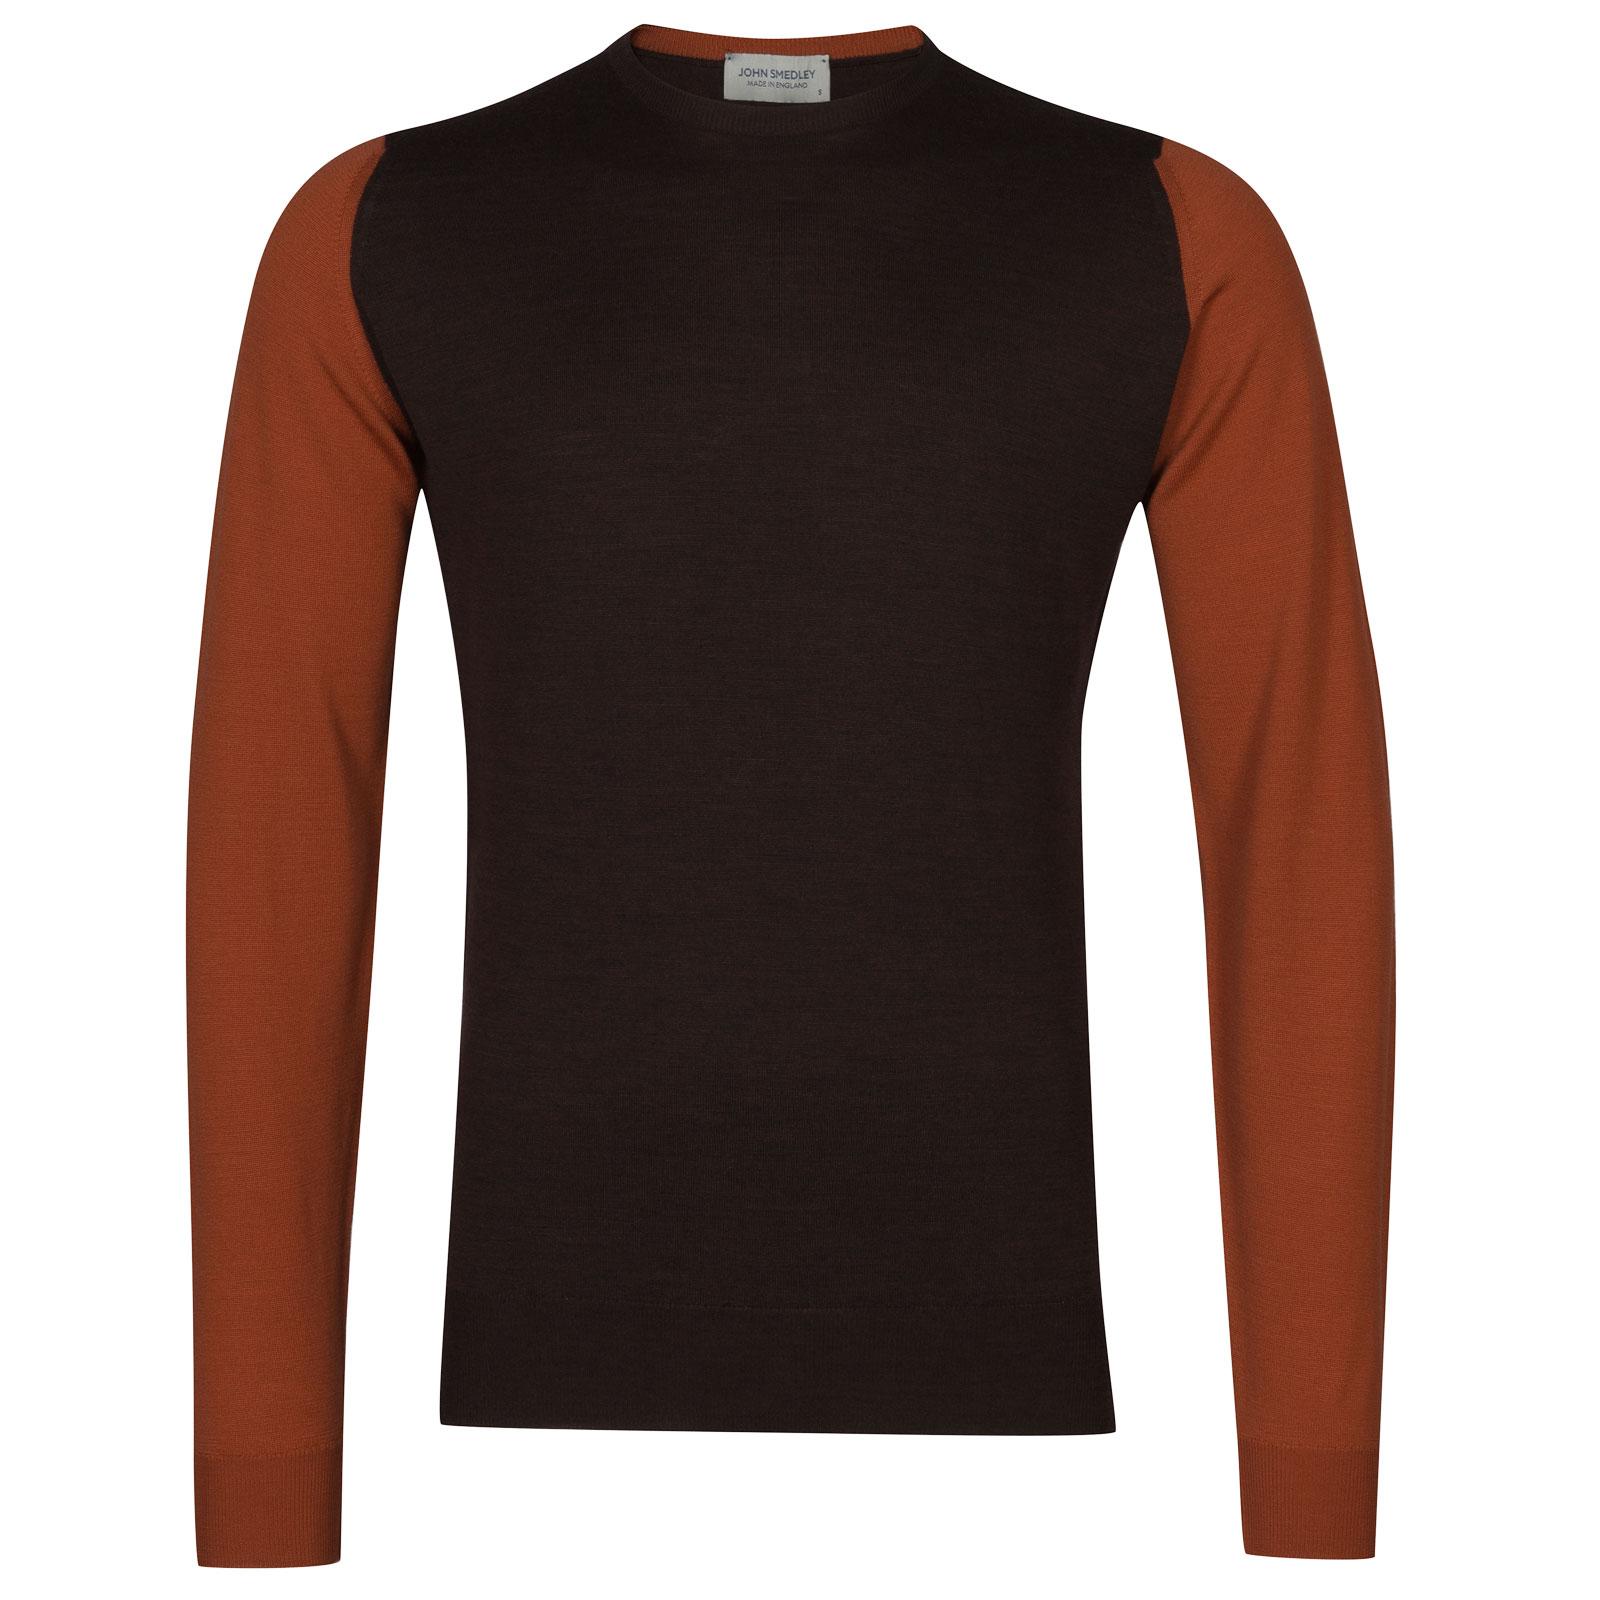 John Smedley hindlow Merino Wool Pullover in Chestnut/Flare Orange-XL